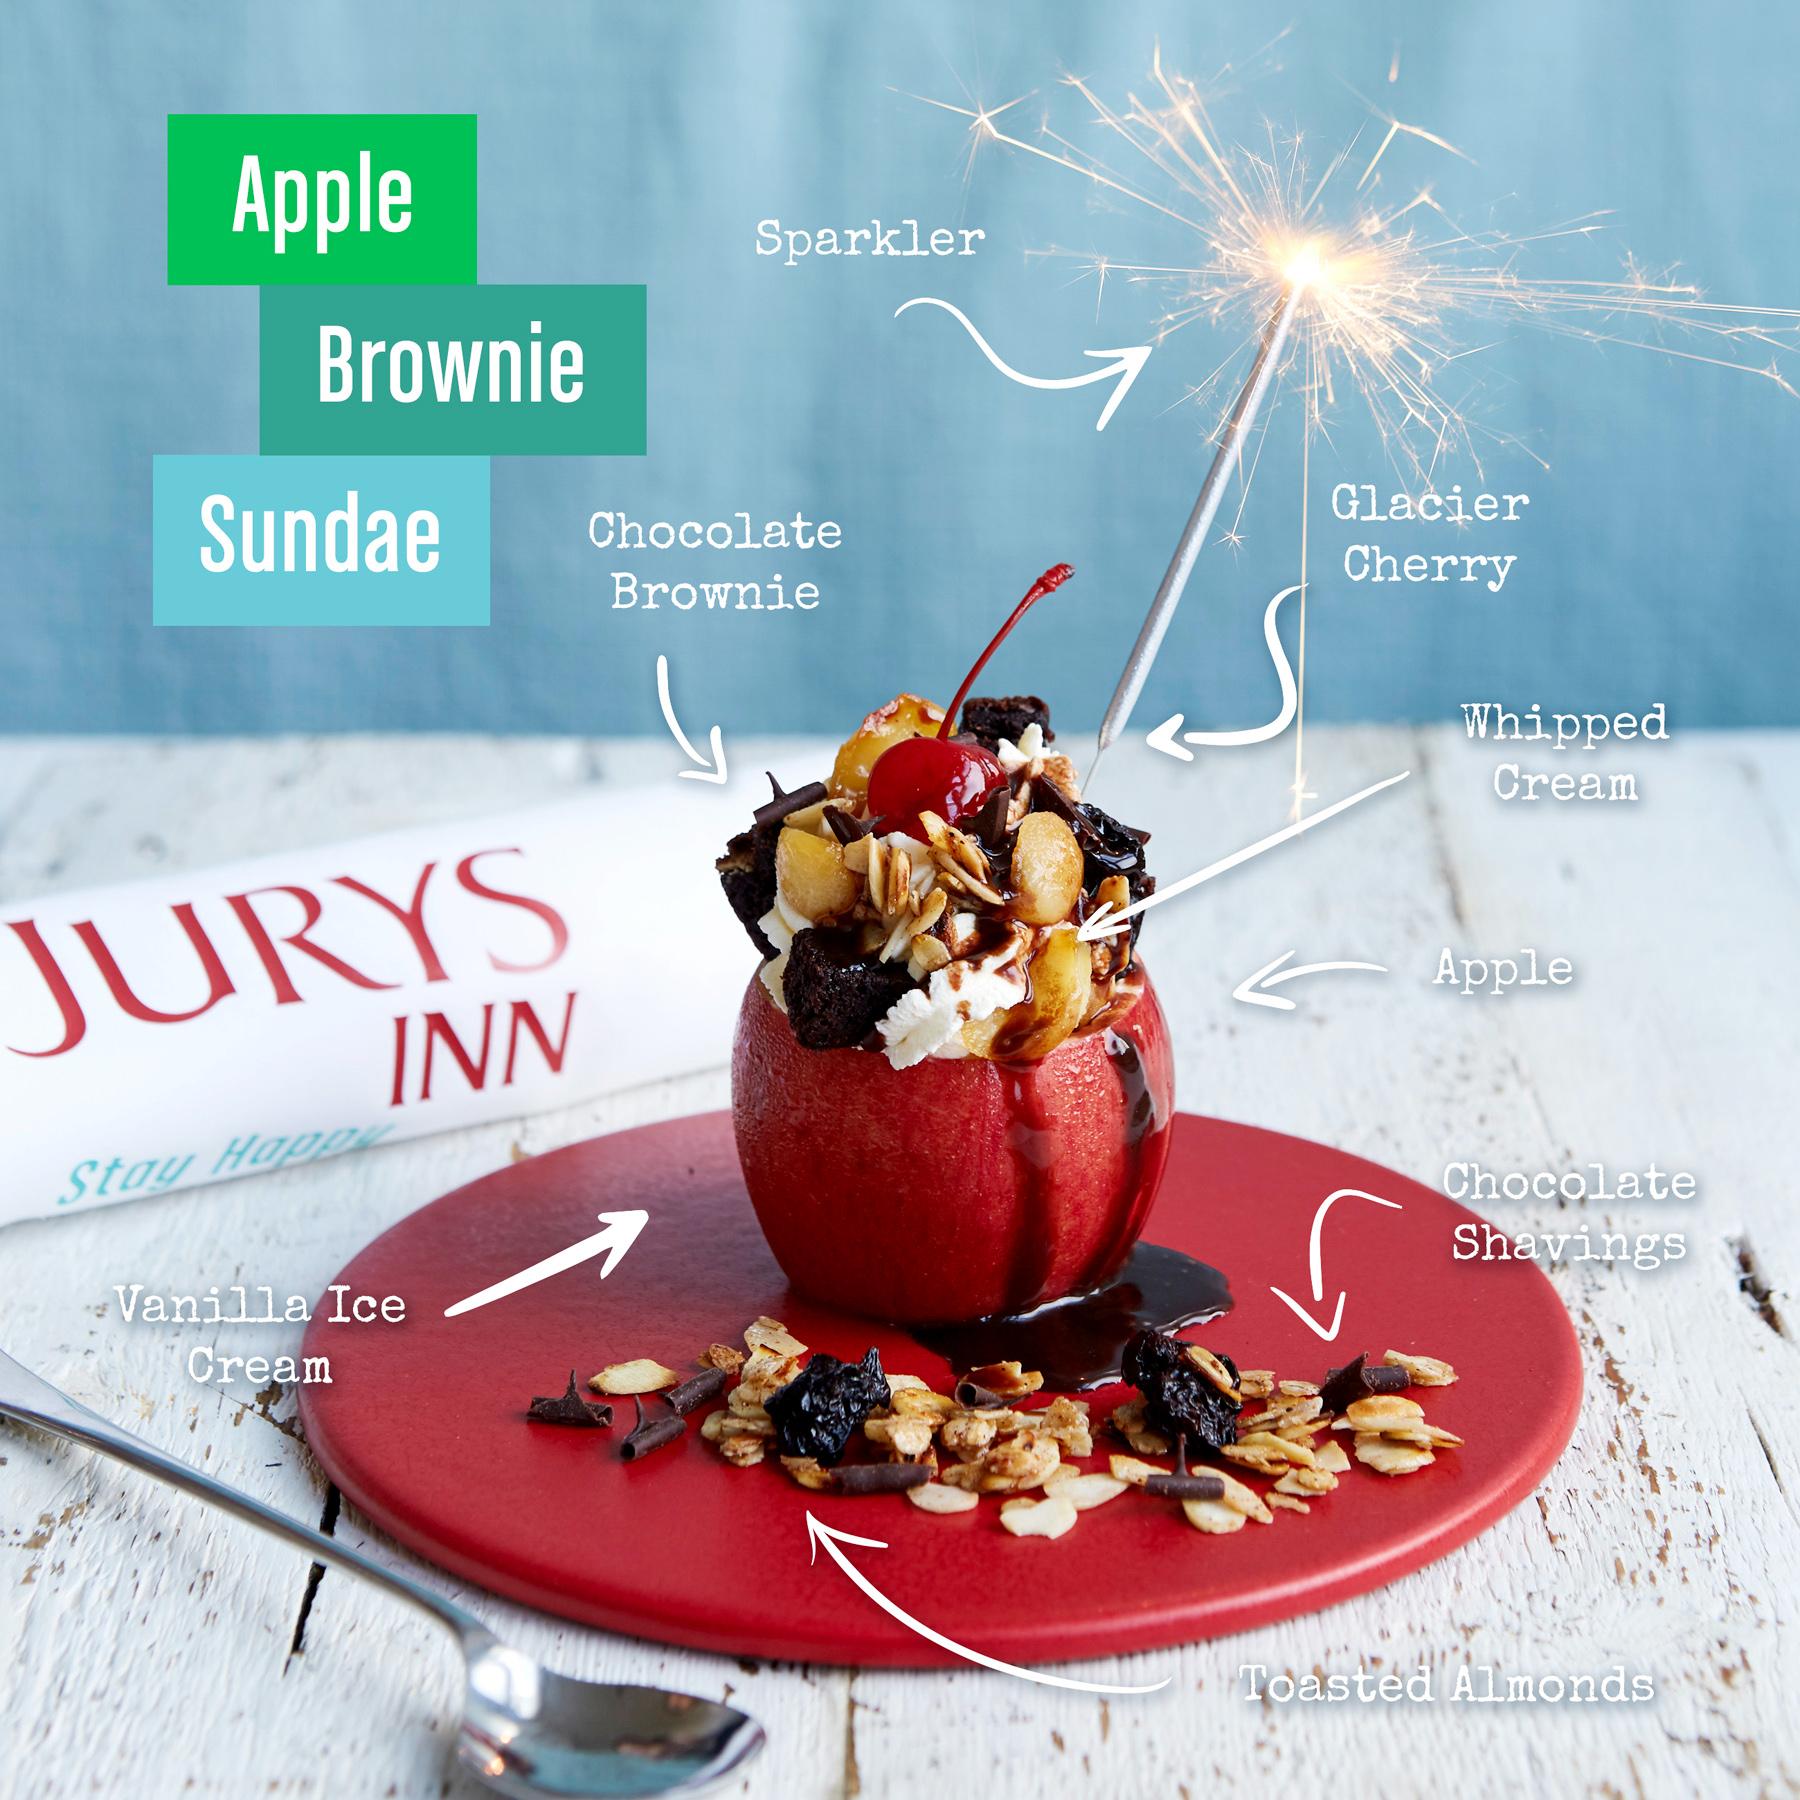 Annotated Apple Brownie Sundae Branded.jpg